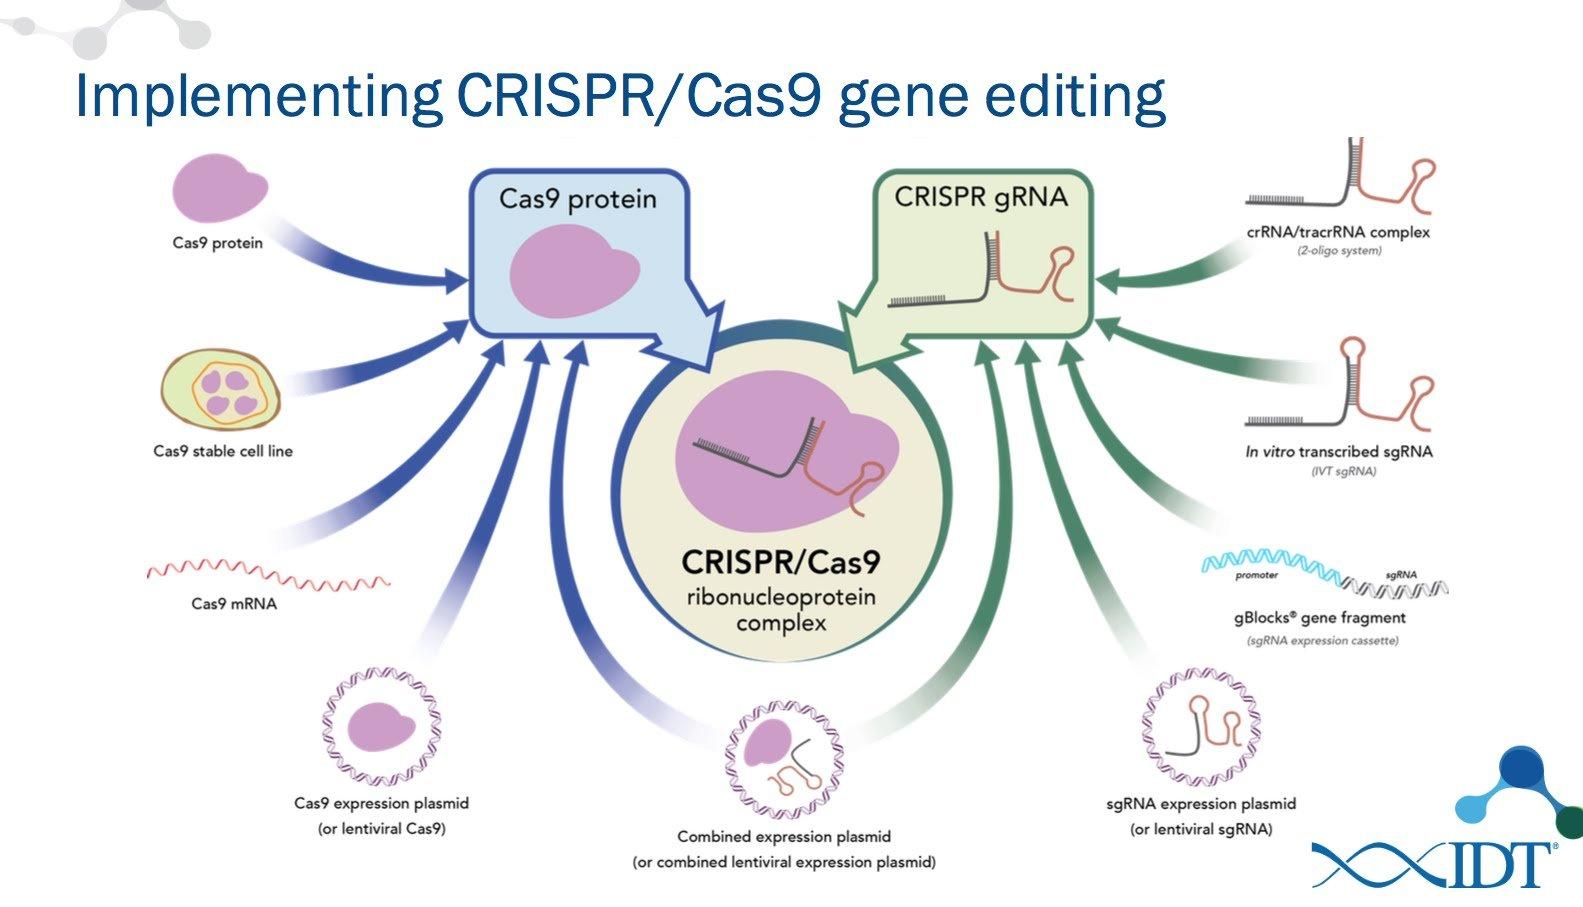 Human Gene Editing Is Leaving Ethics Dangerously Far Behind